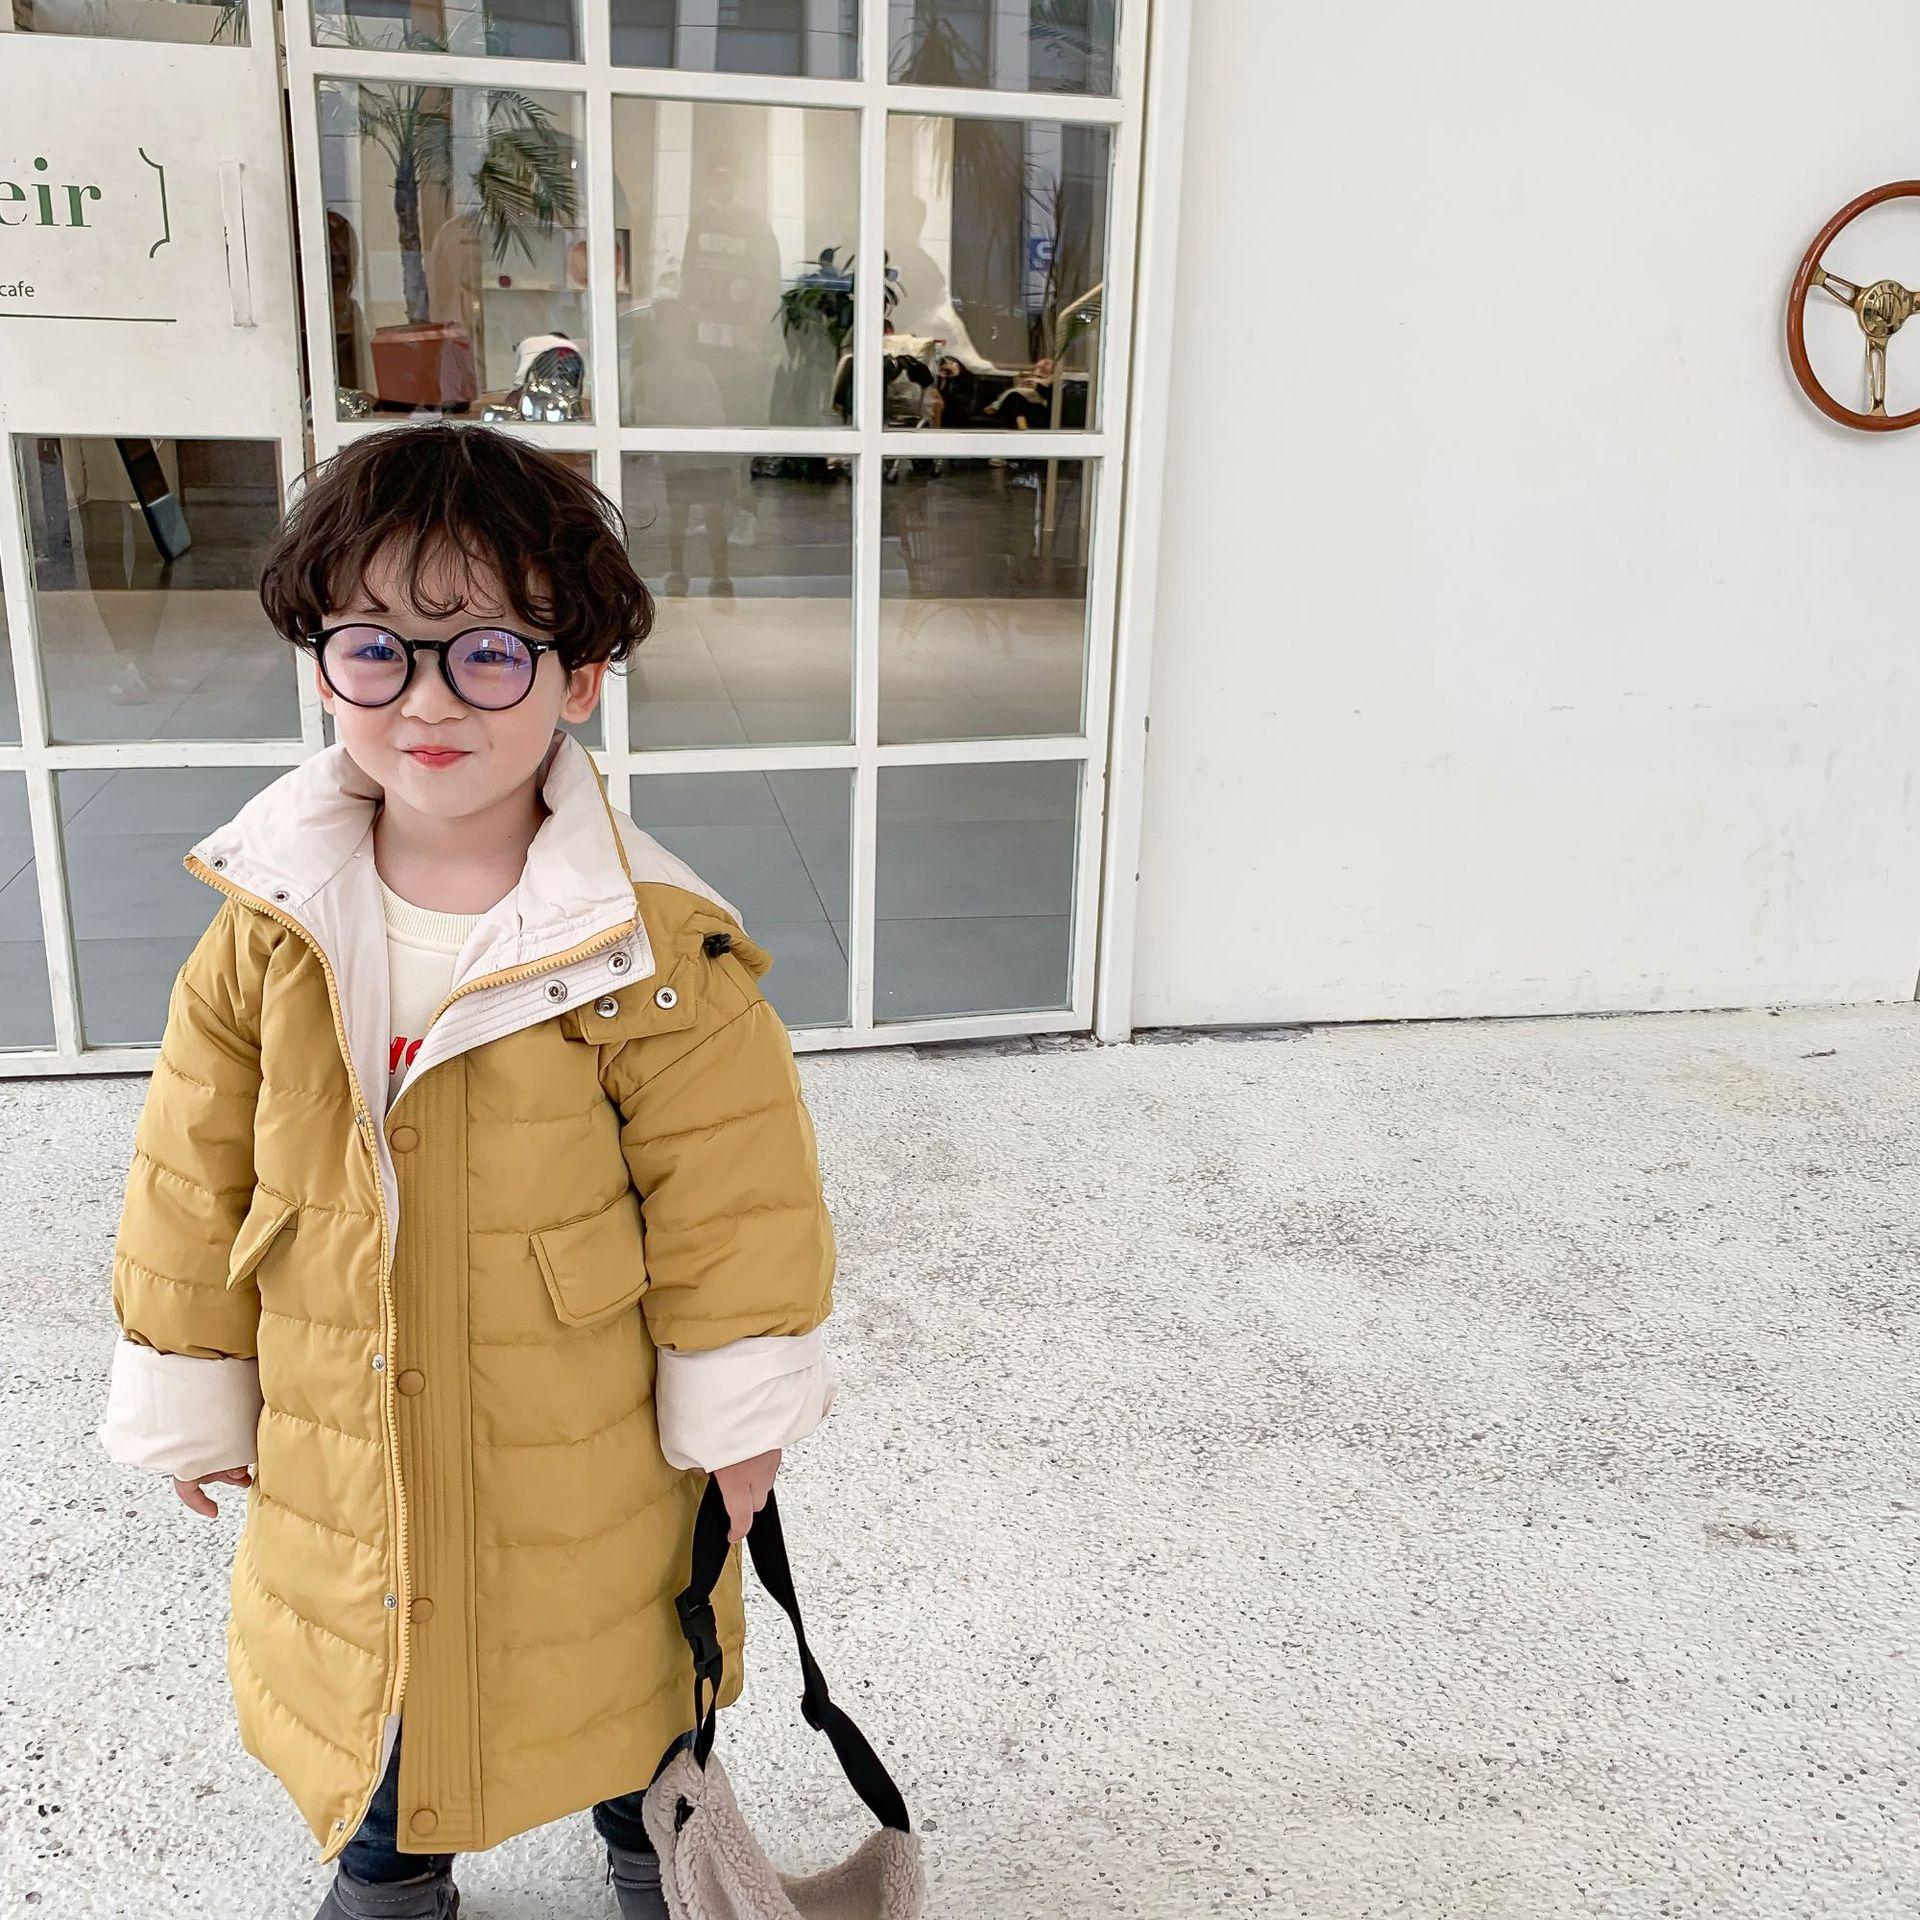 2019 Children 's Clothing Winter New Korean Version Of The Children 's Pants Warm Wind-Resistant Down Jacket Coat